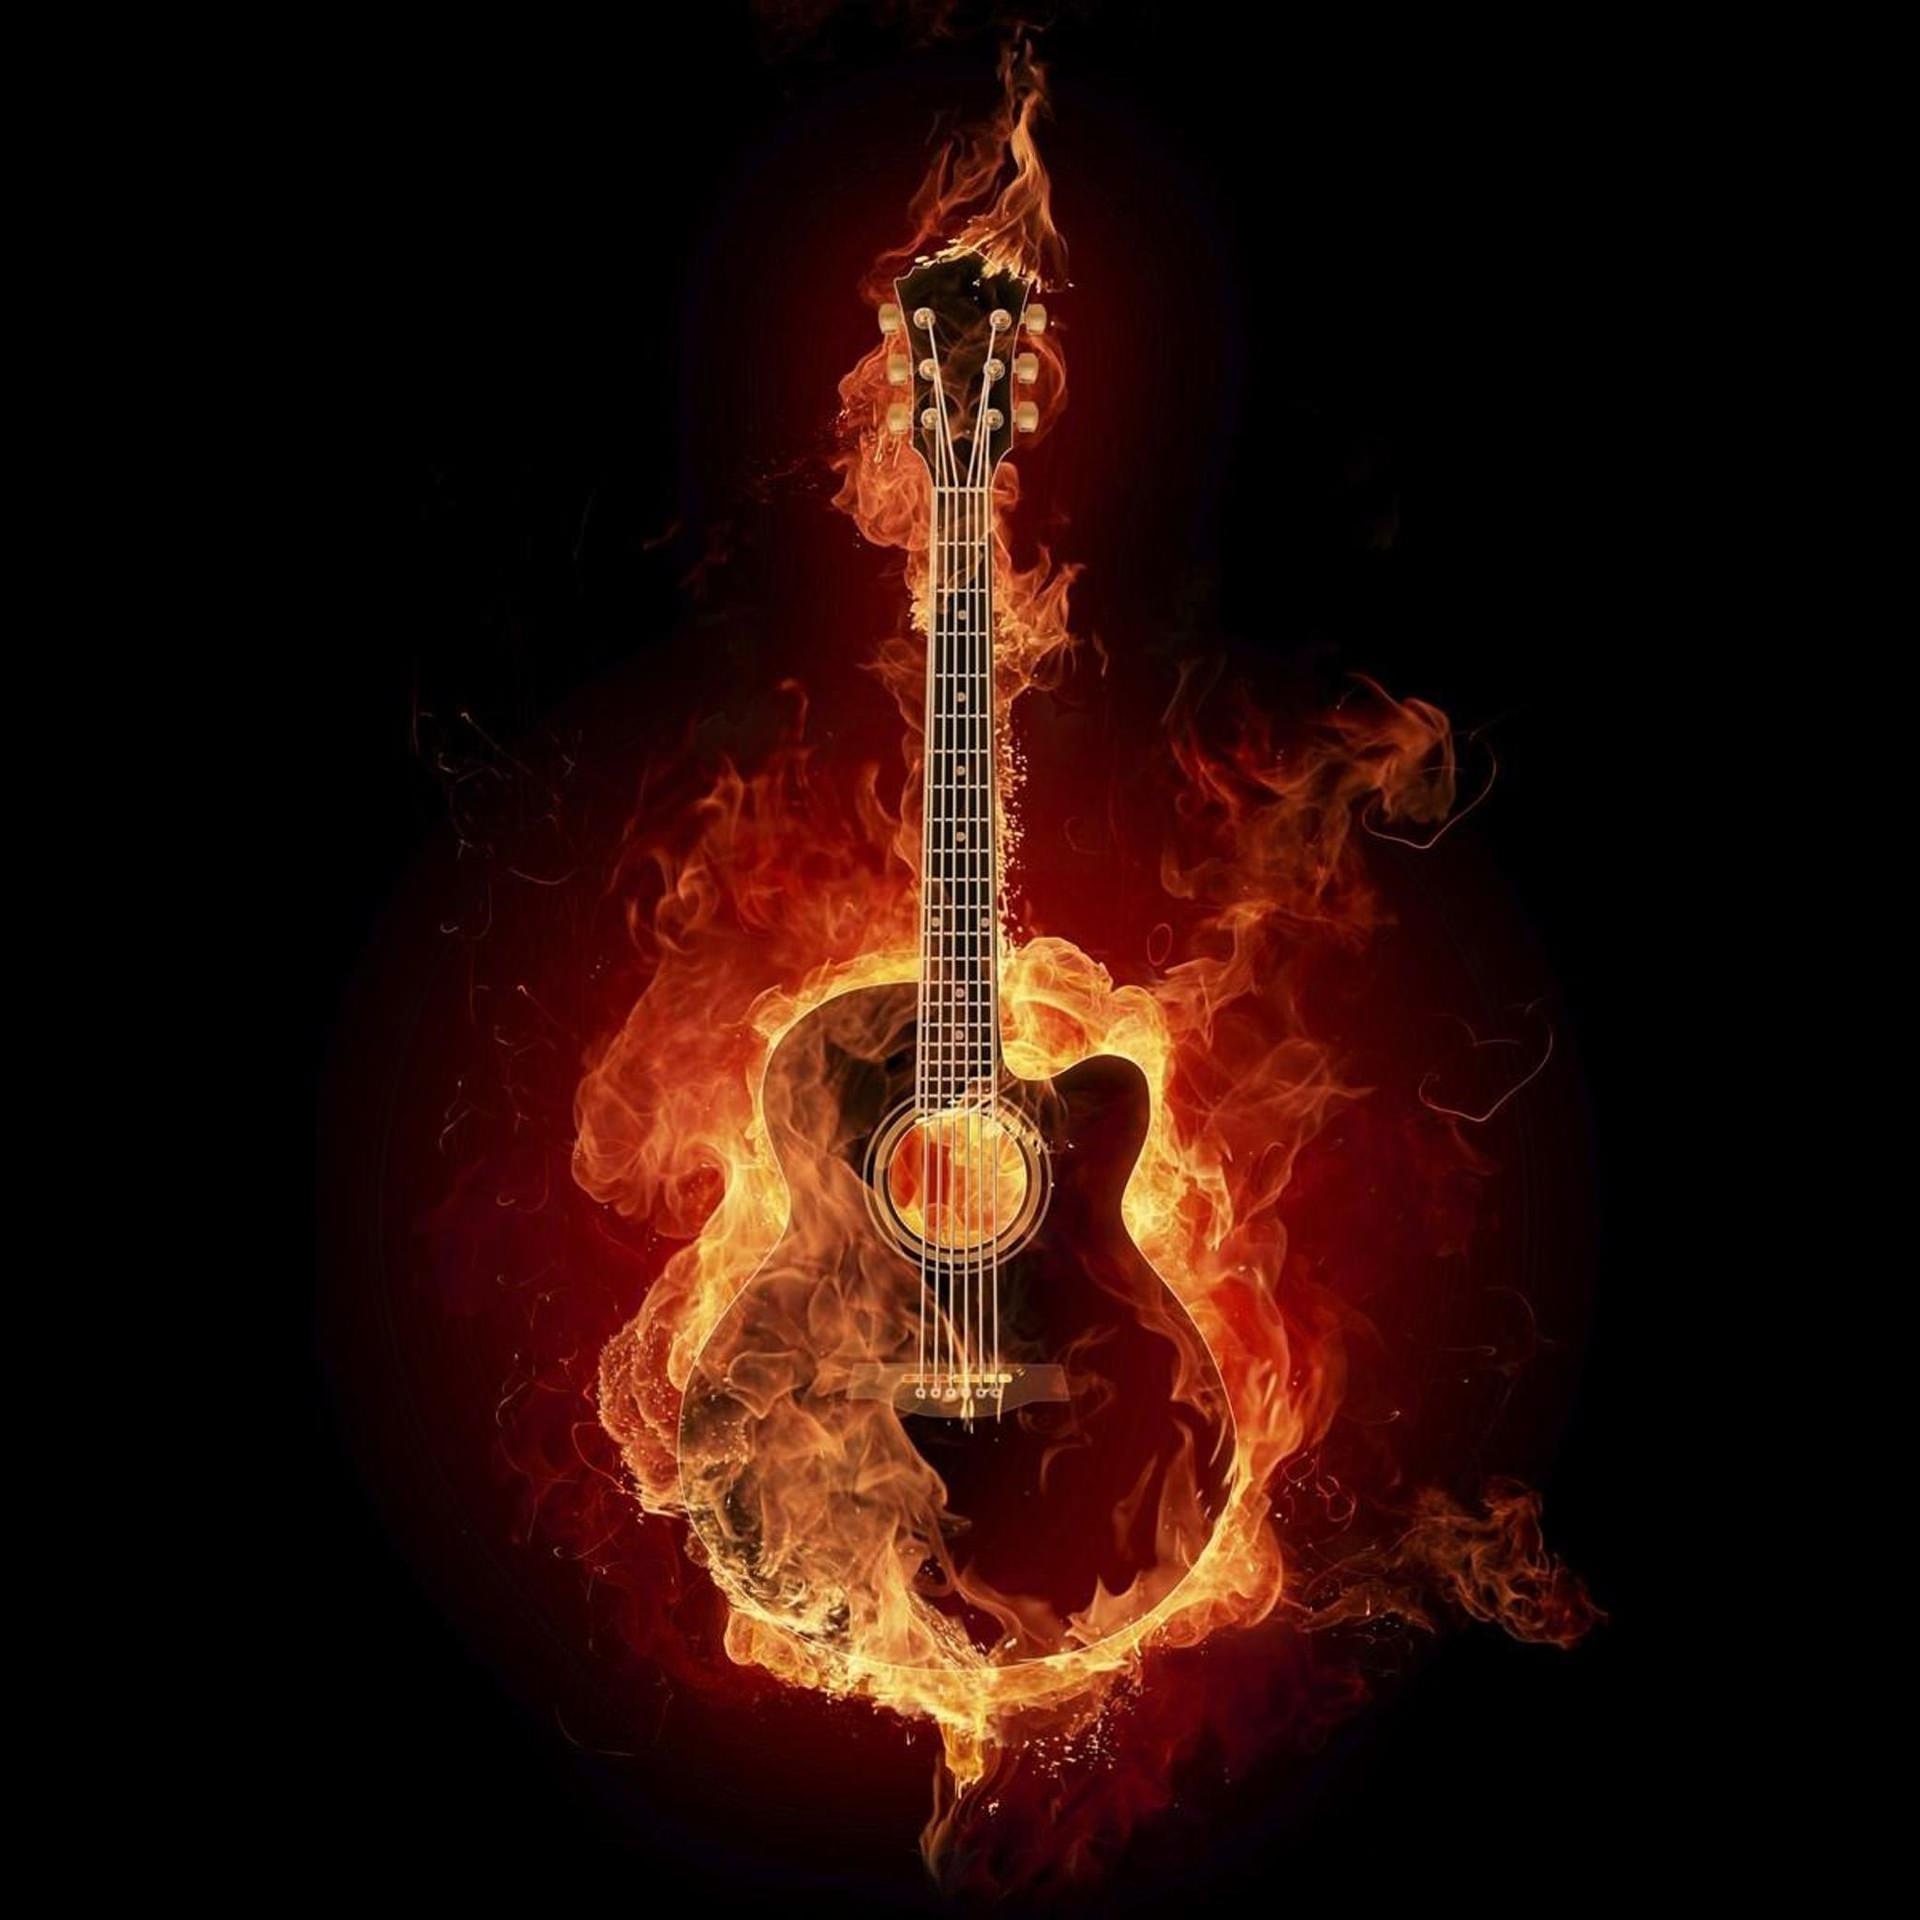 Cool Guitar Flame Wallpapersc Smartphone